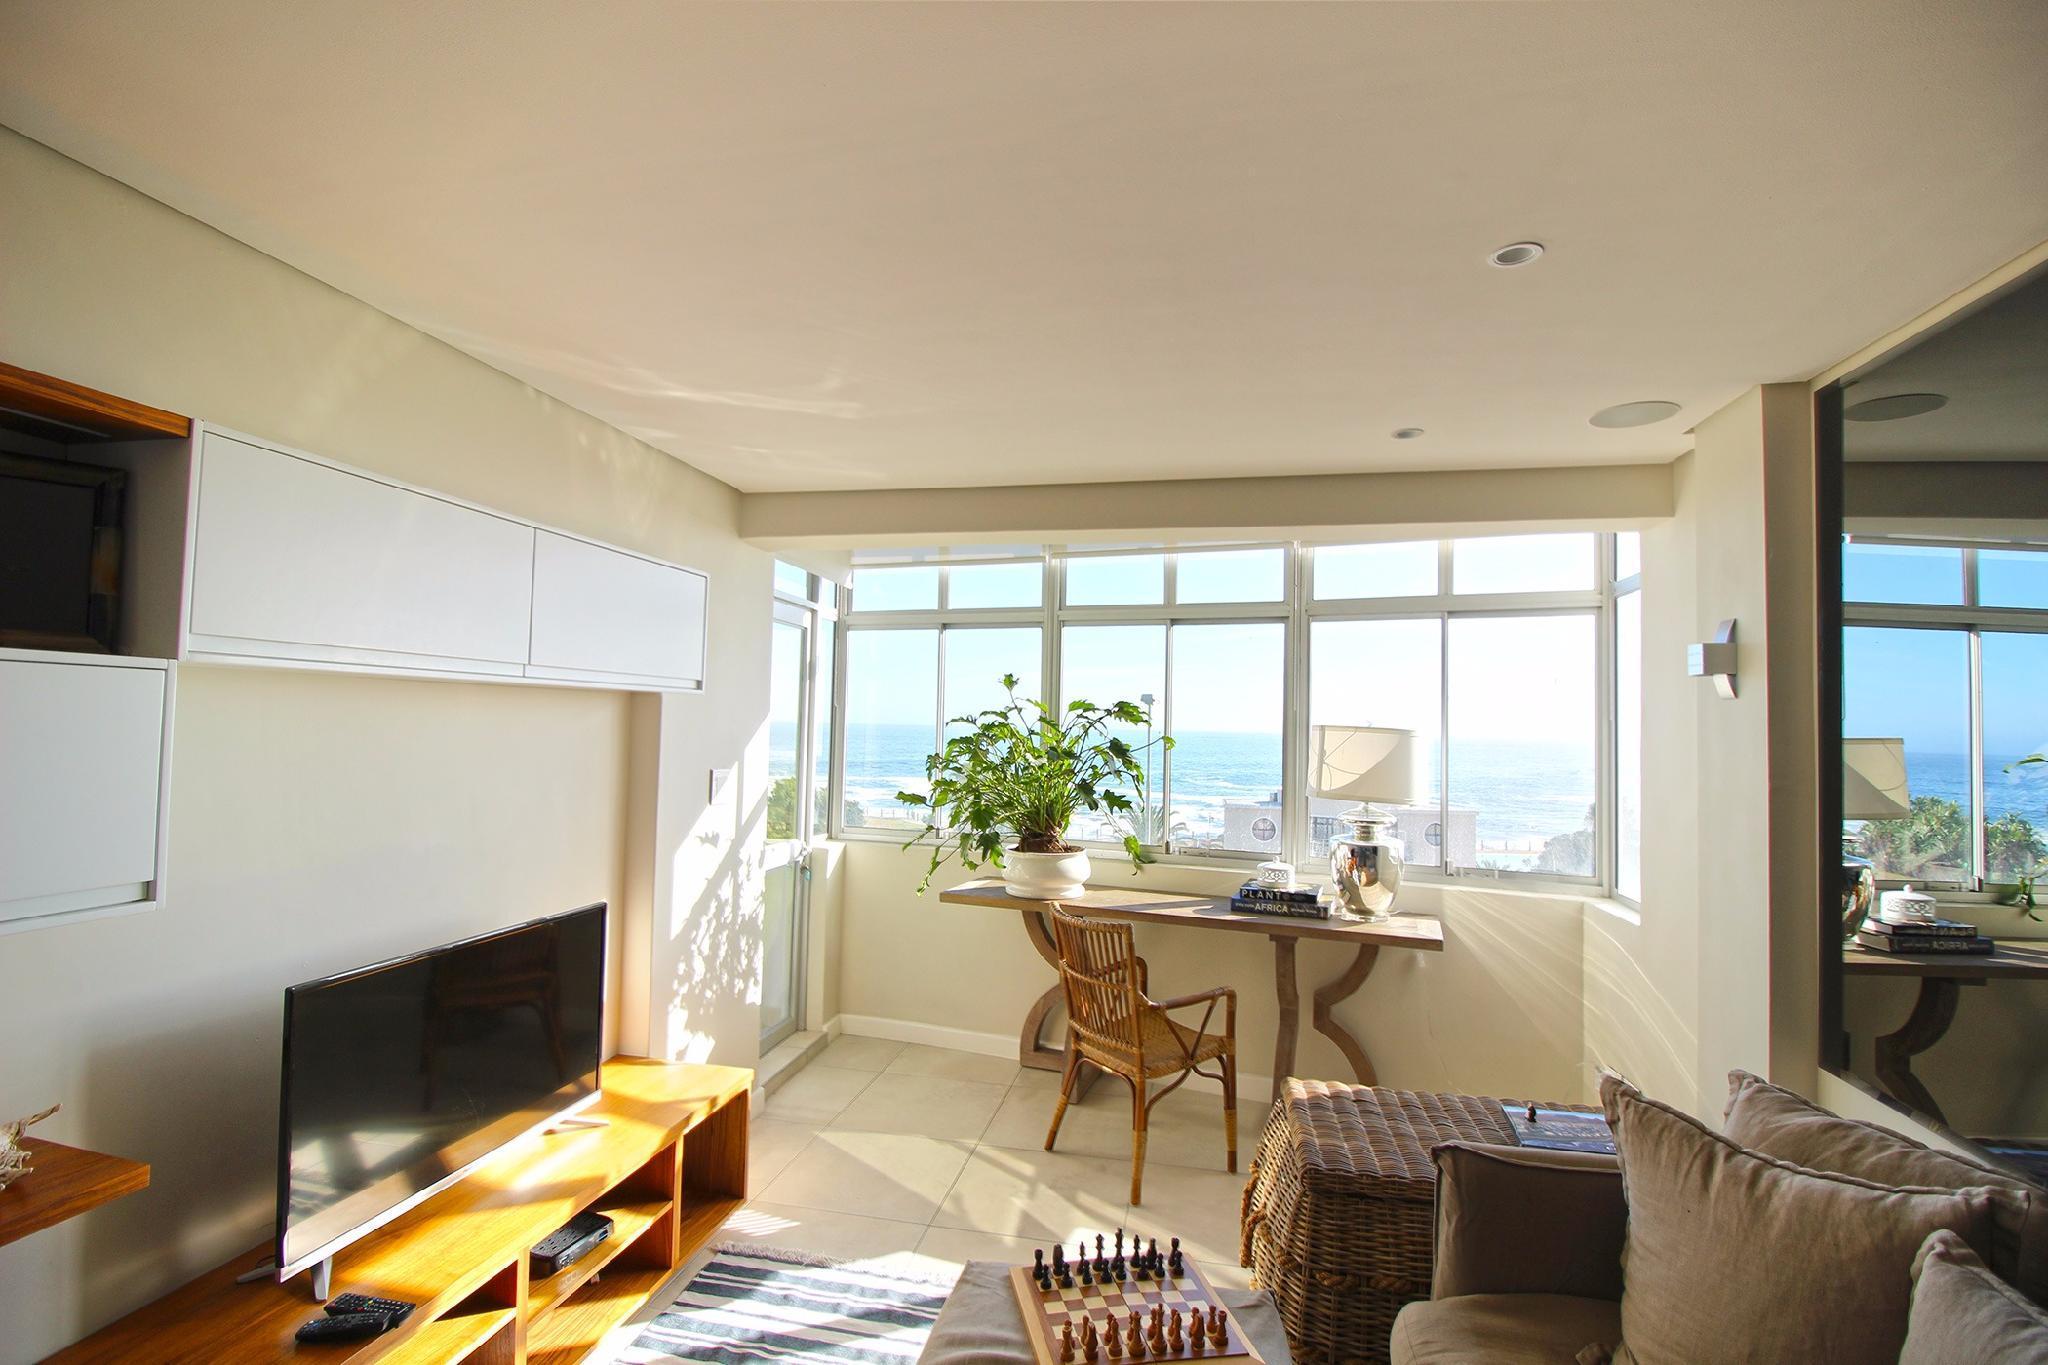 Stunning 2 Bedroom Apartment Overlooking The Famous Beach Promenade